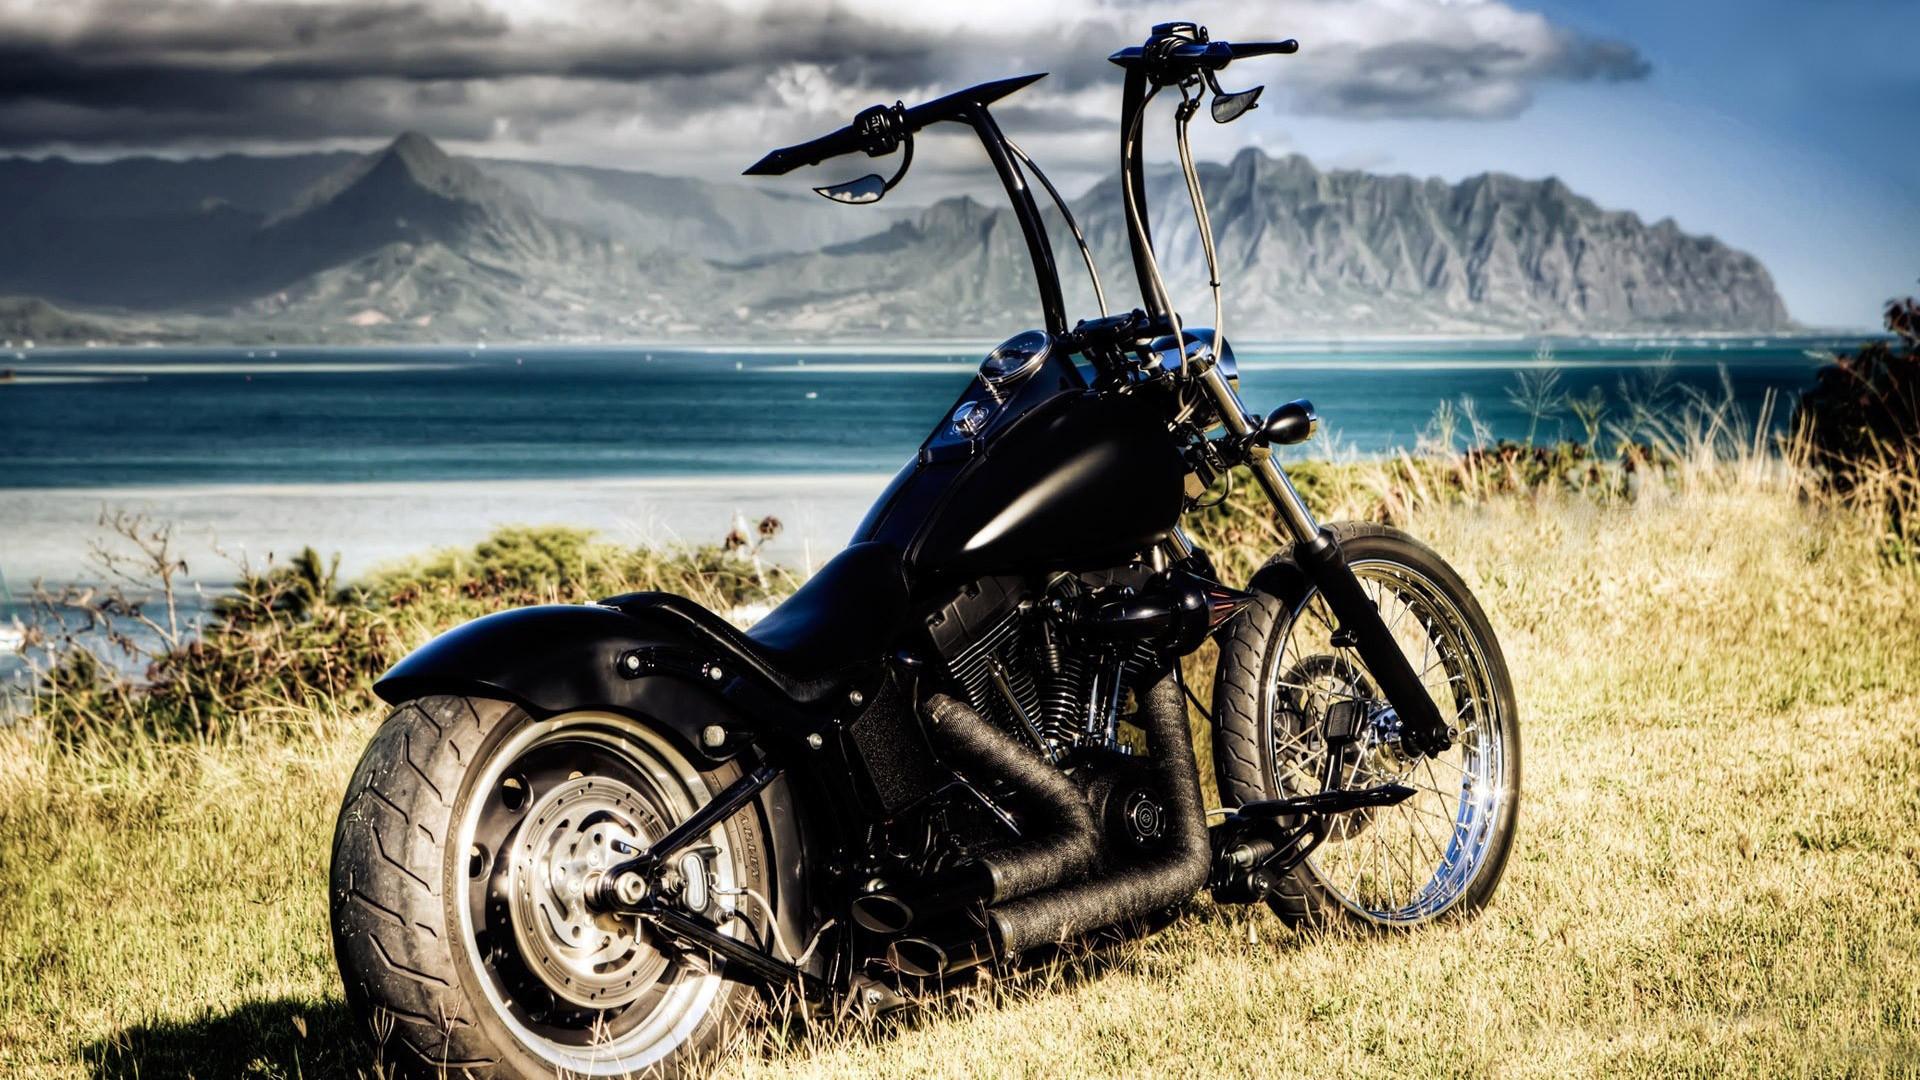 Hd Electric Bike Images Bike Hd Wallpapers 1920x1080: Chopper Wallpapers HD (65+ Images